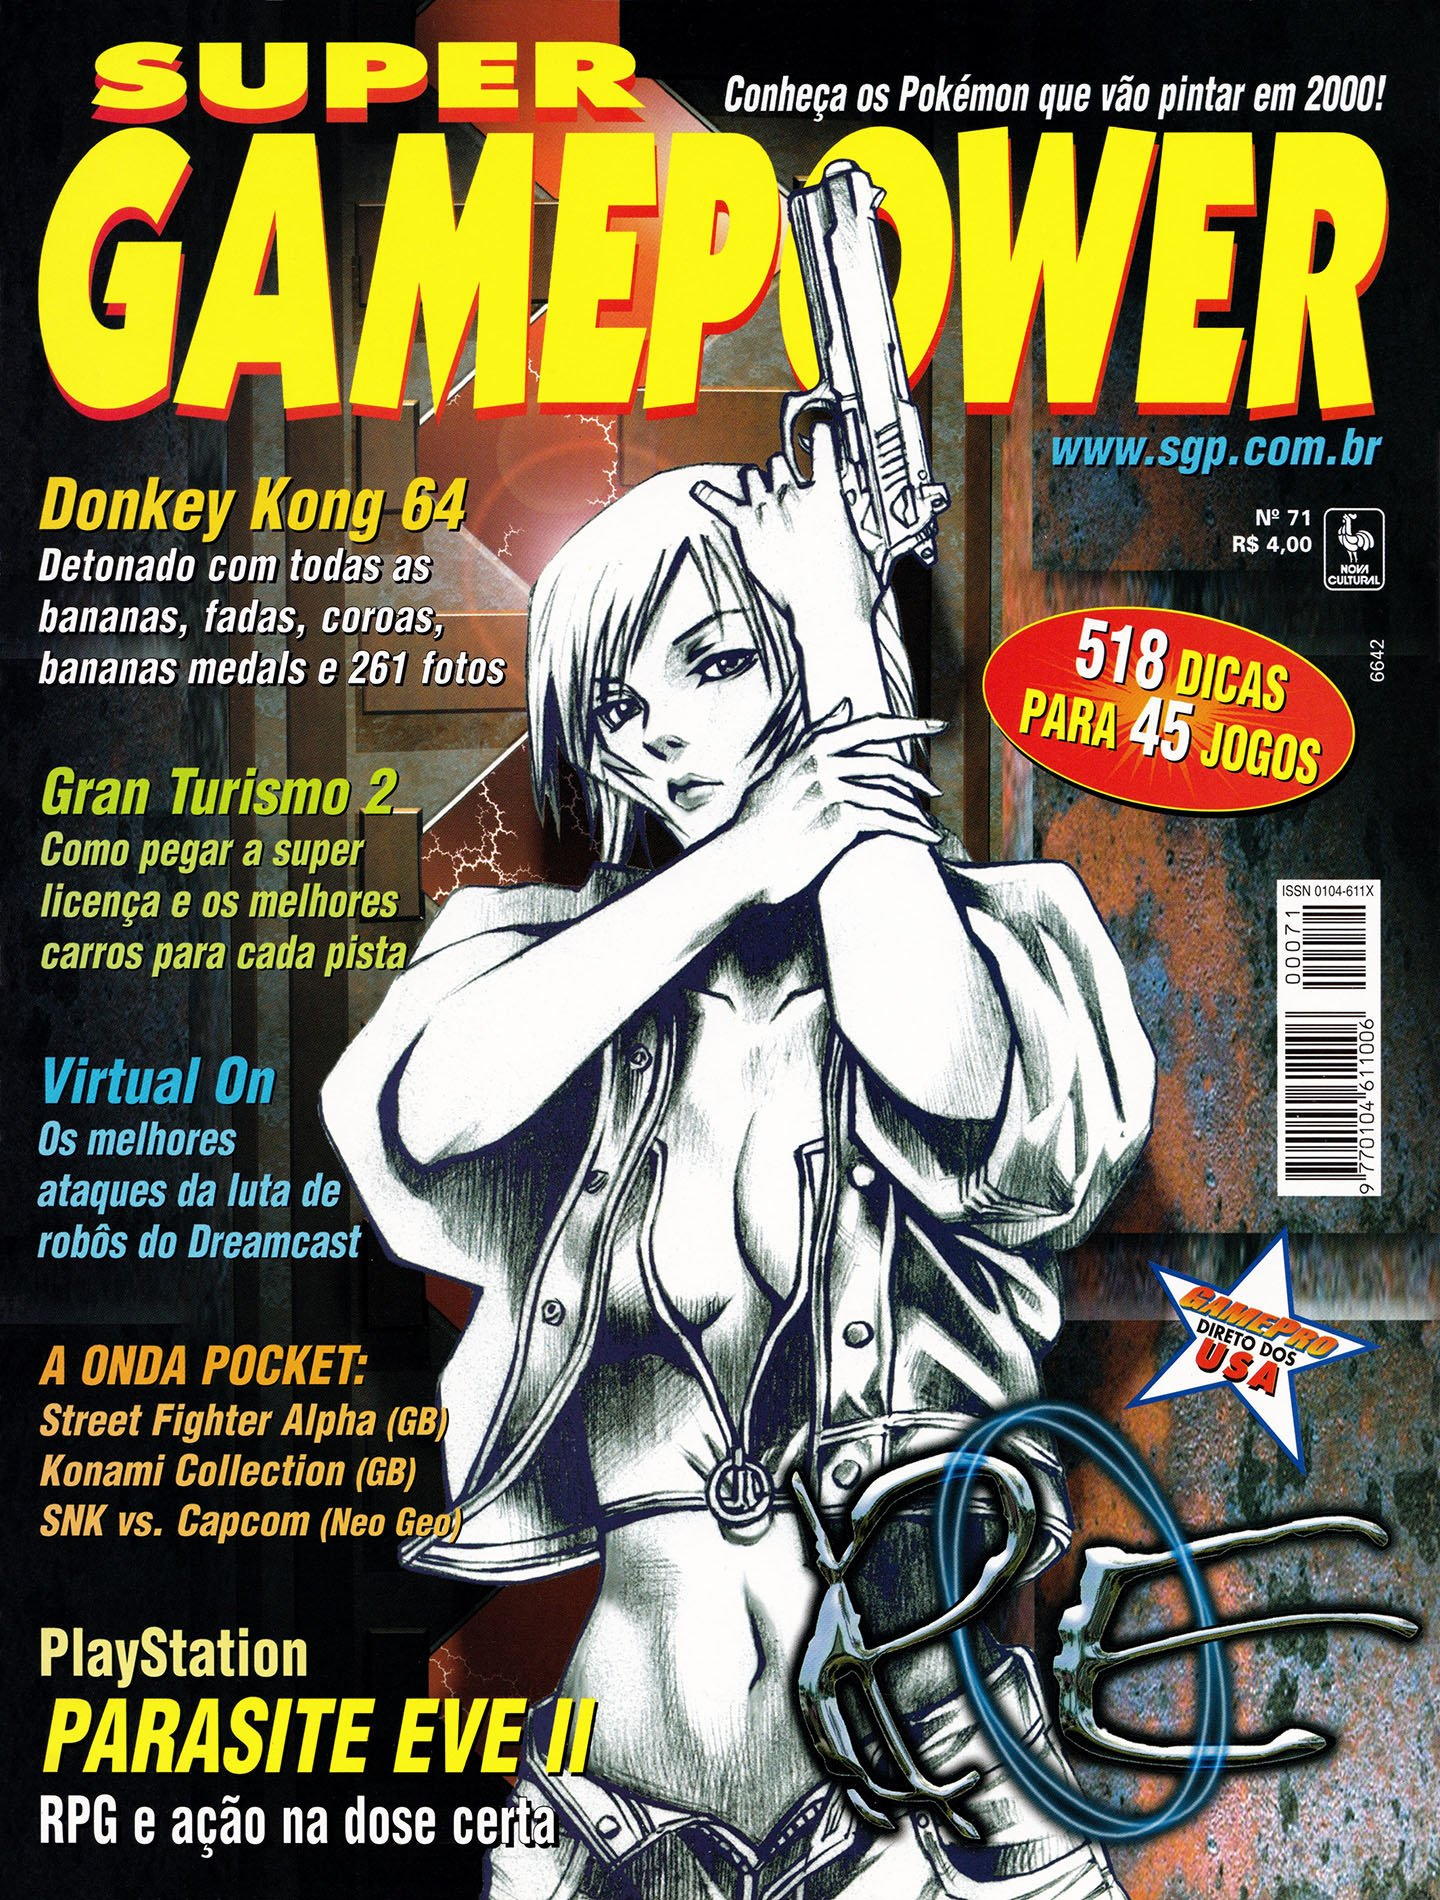 SuperGamePower Issue 071 (February 2000)